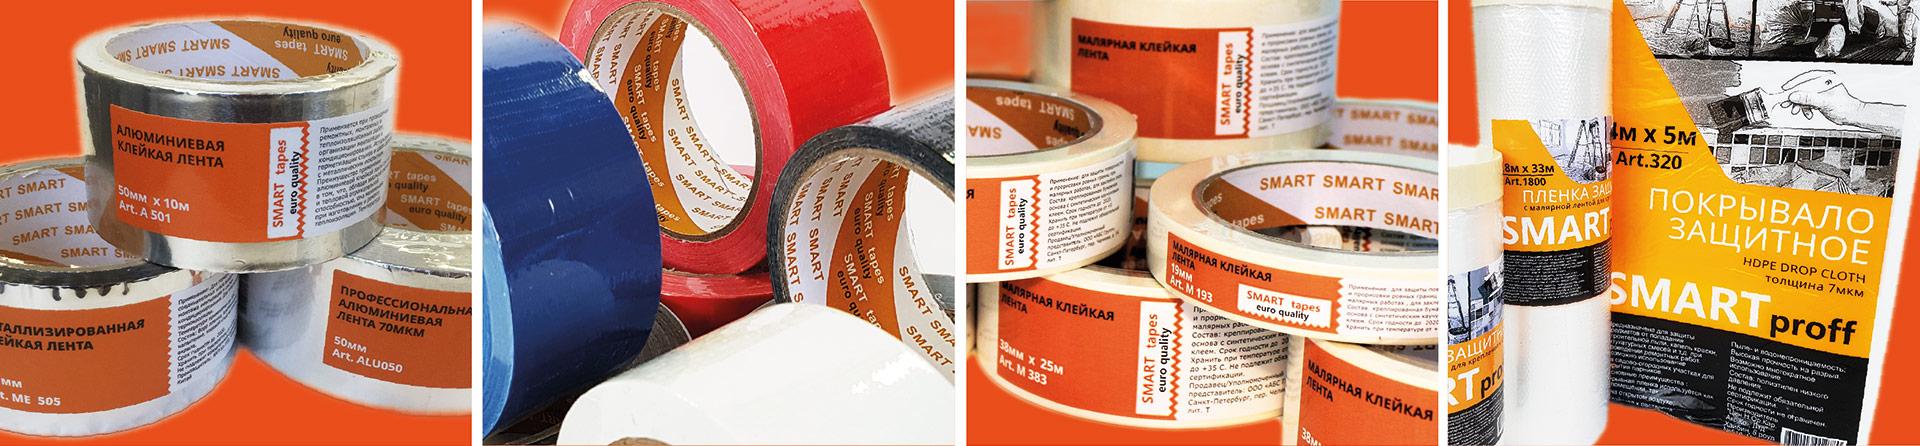 Smarttapes - клейкая лента, укрывная плёнка, изолента пвх, лента ПСУЛ, стретч плёнка, упаковочные материалы